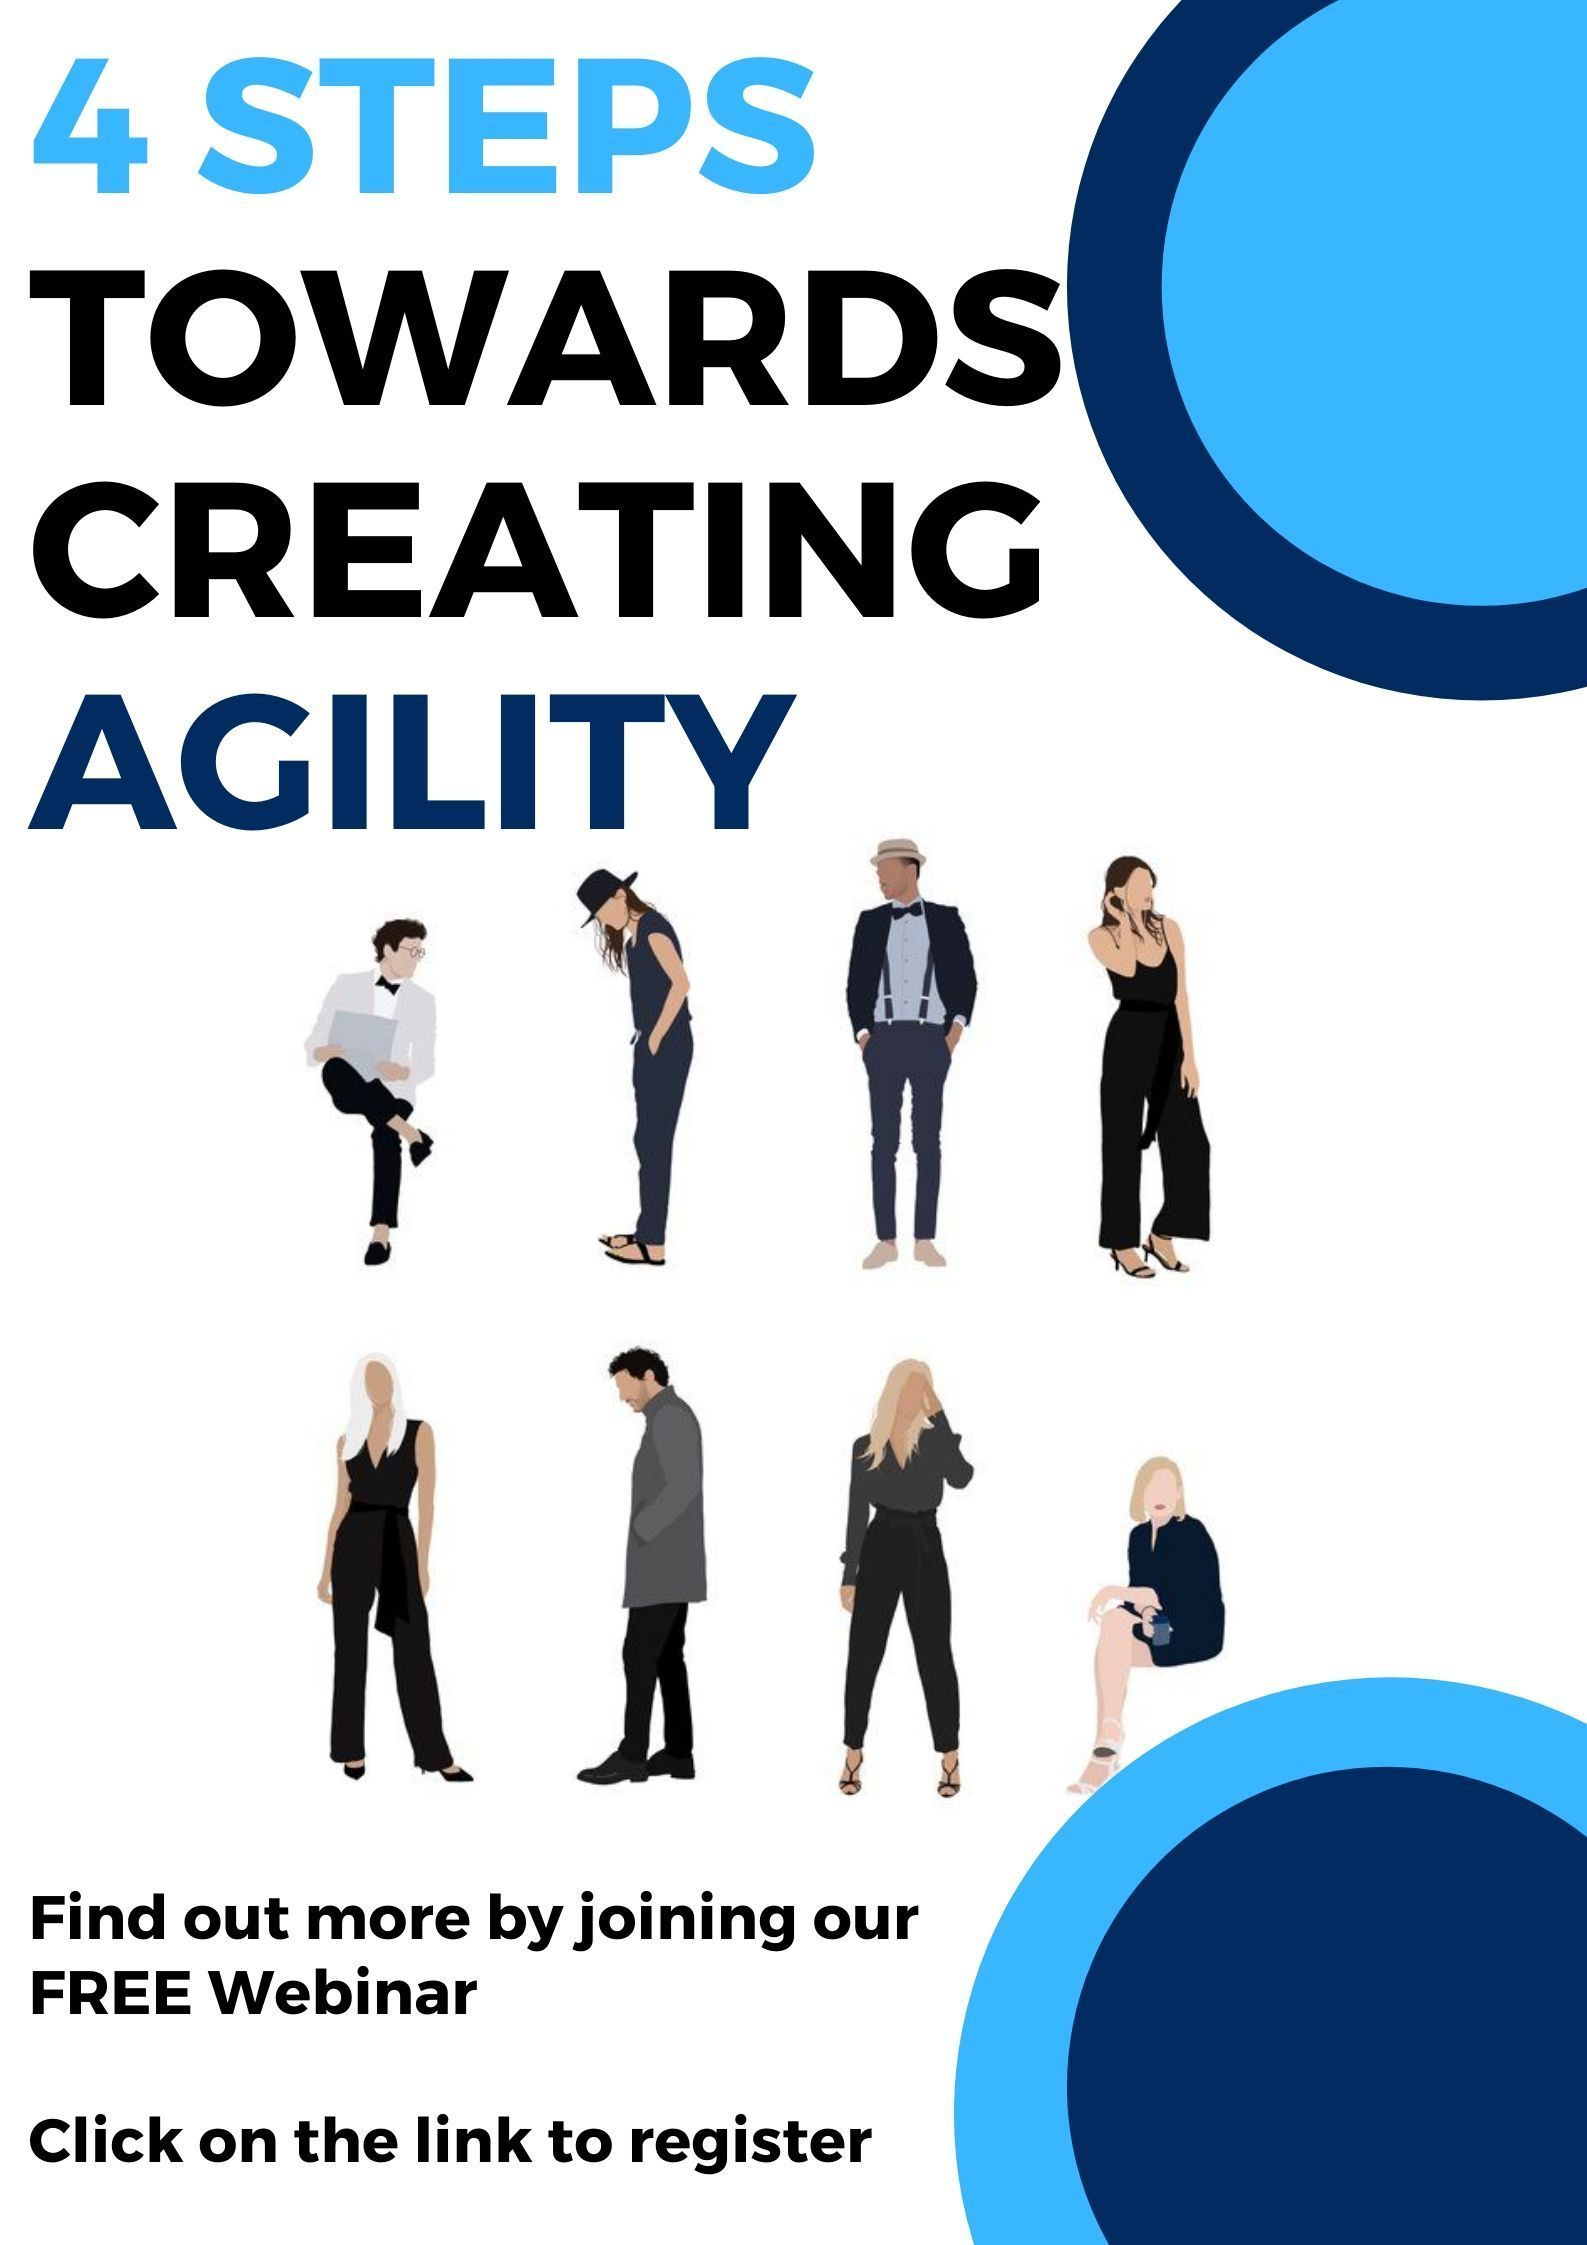 4 Steps towards creating Agility in 2020 Webinar, Free